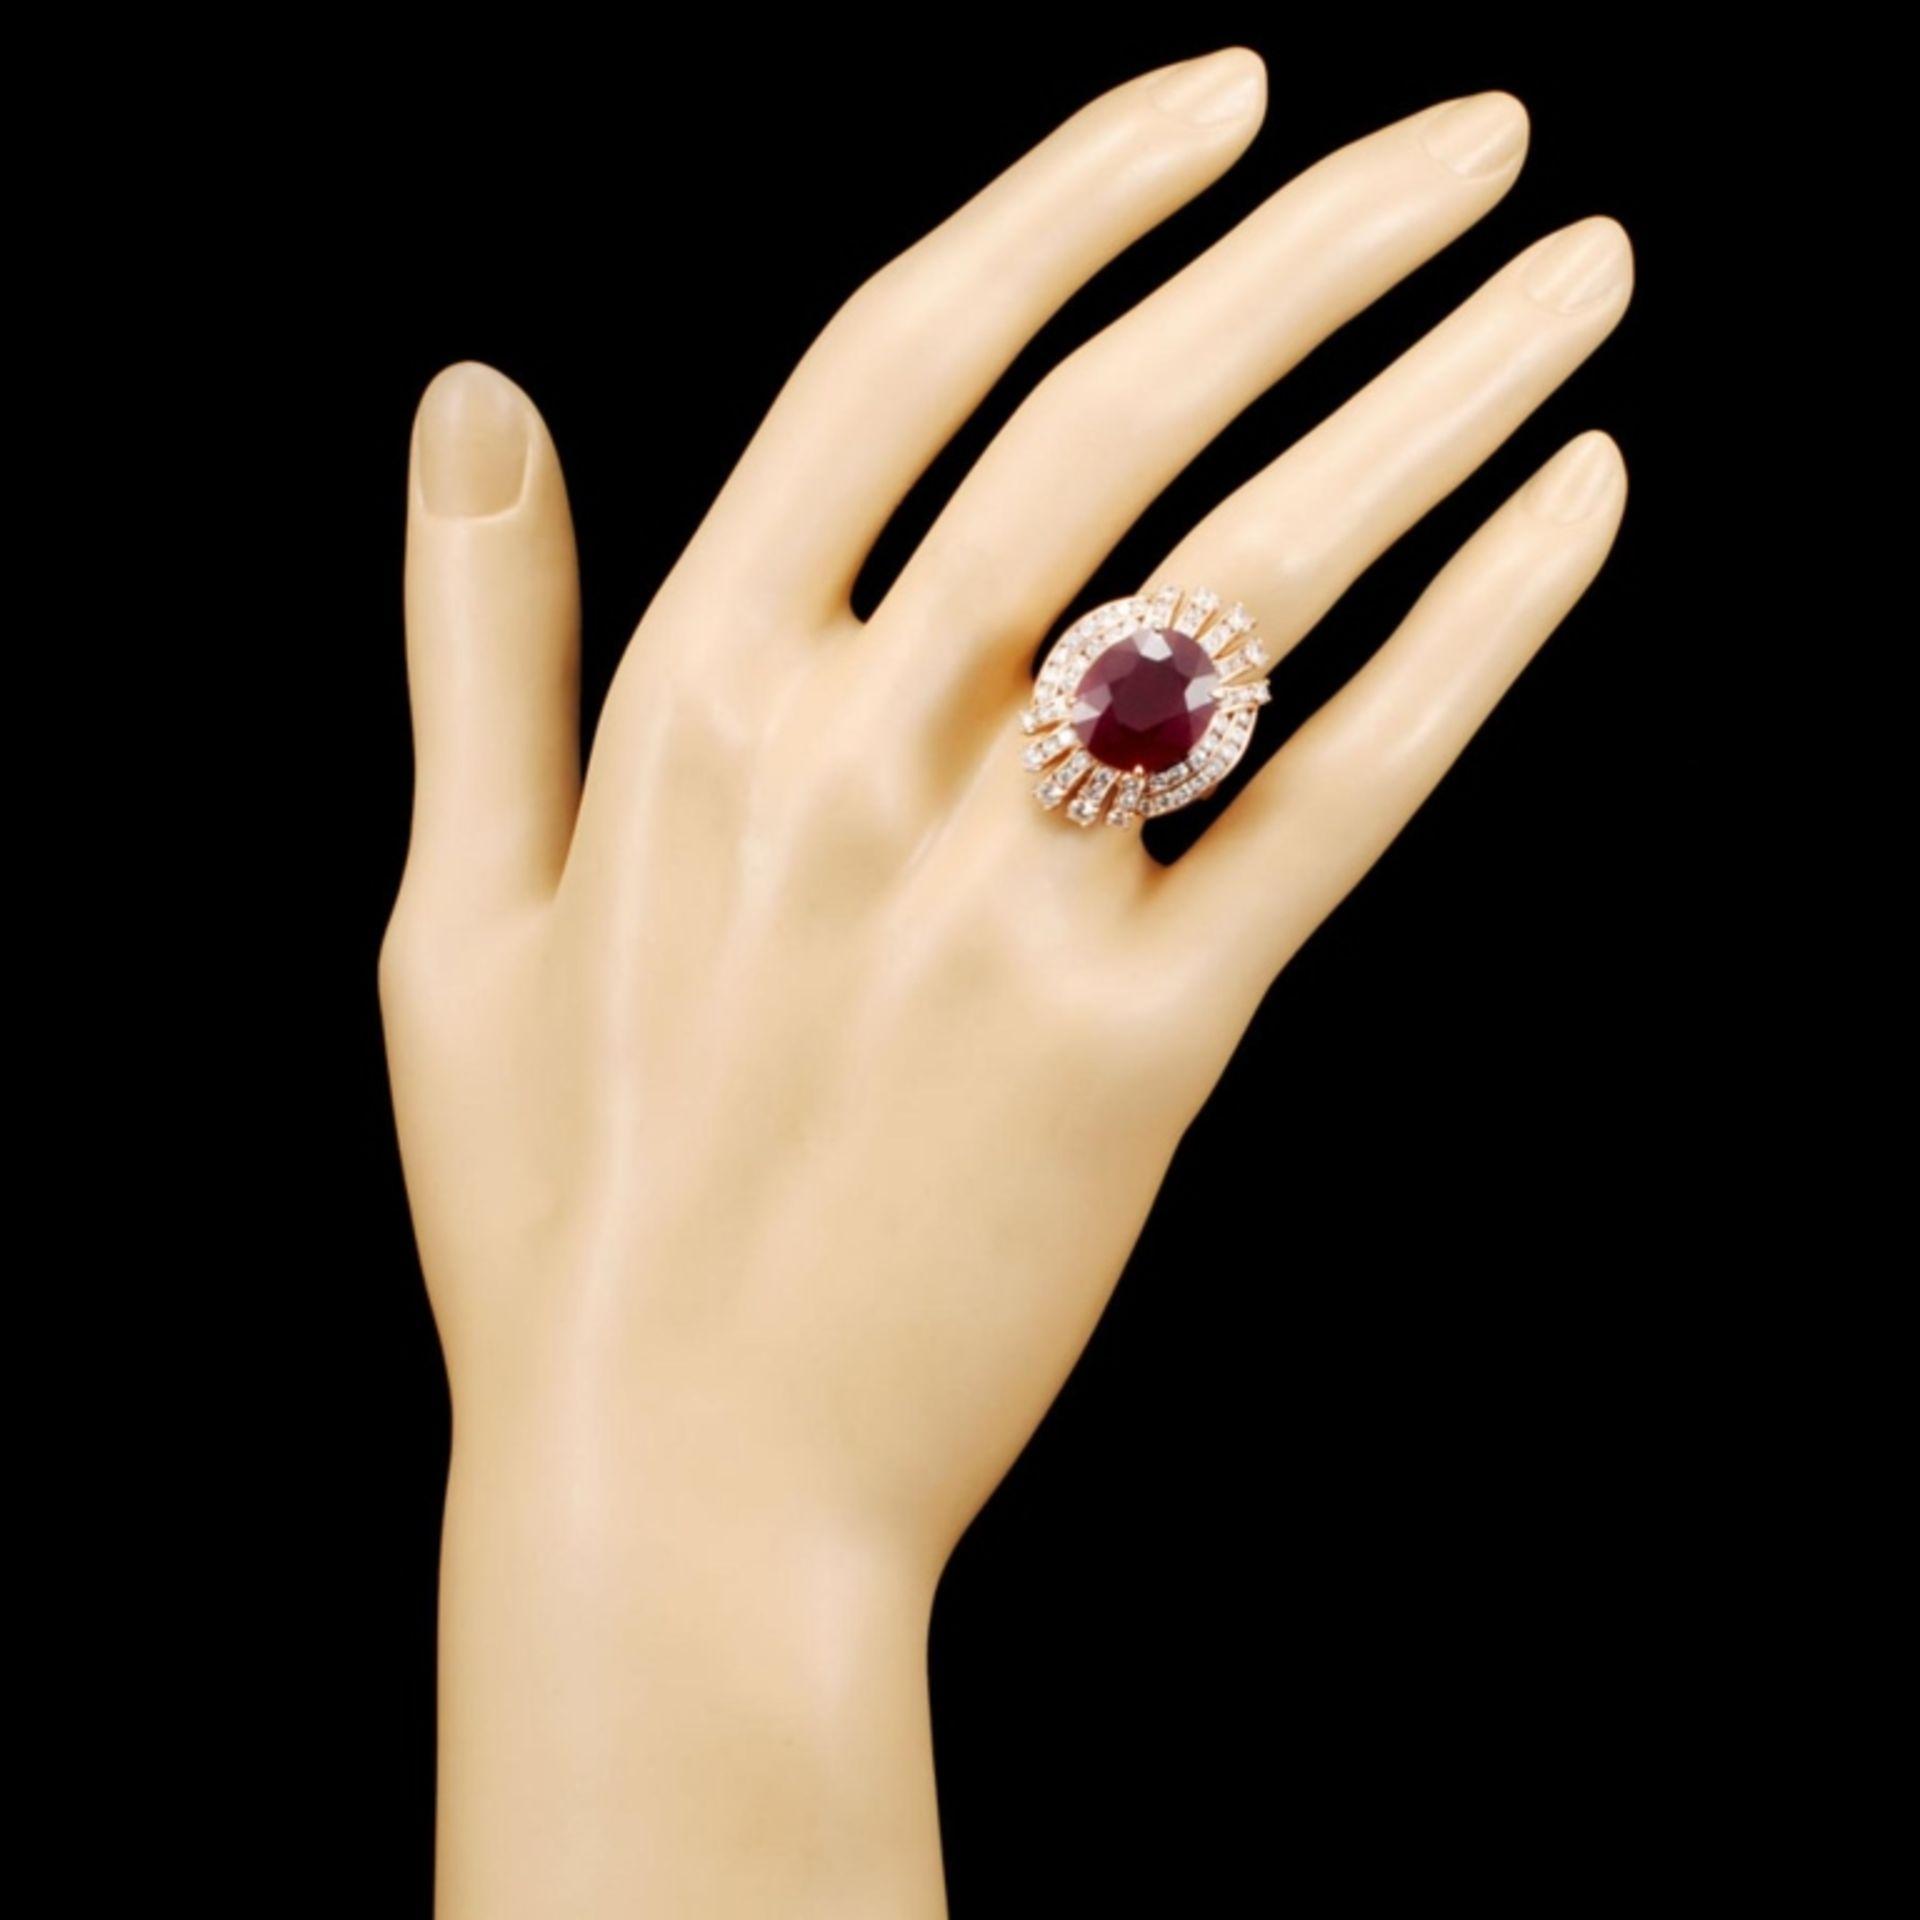 14K Gold 12.24ct Ruby & 2.02ctw Diamond Ring - Image 4 of 5